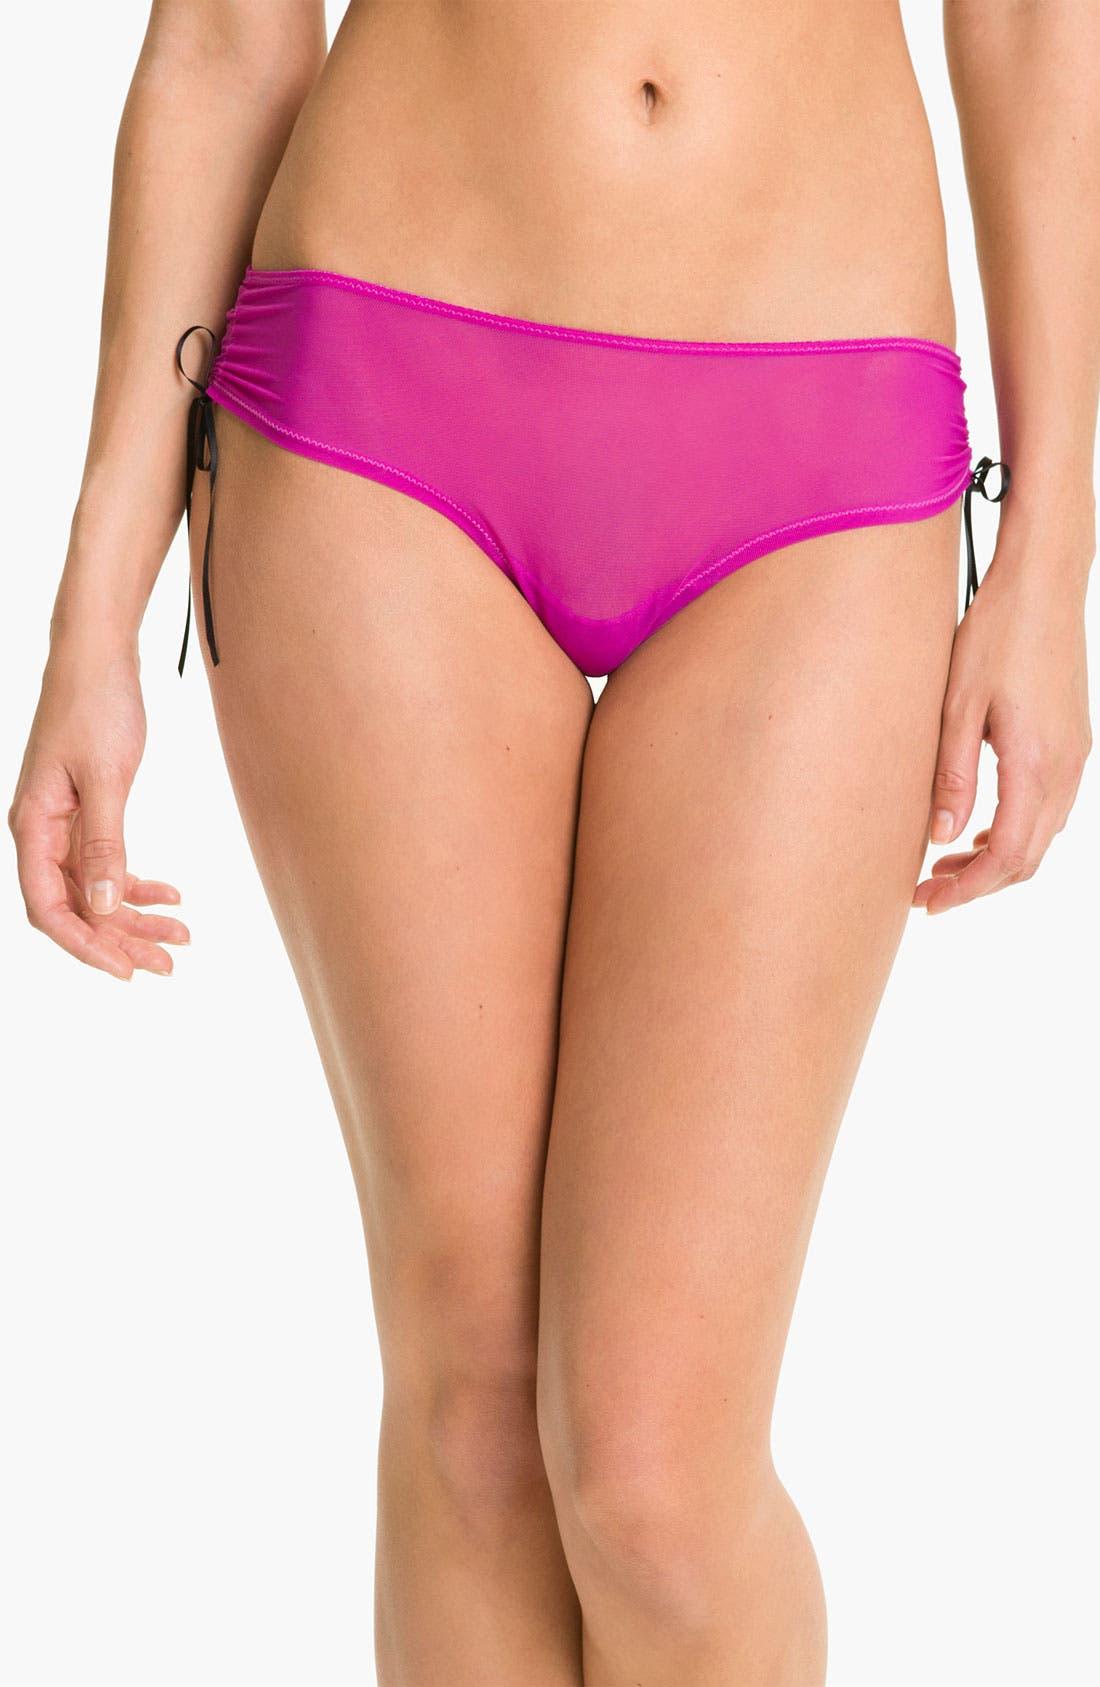 Alternate Image 1 Selected - Betsey Johnson 'It's a Cinch' Girl Leg Briefs